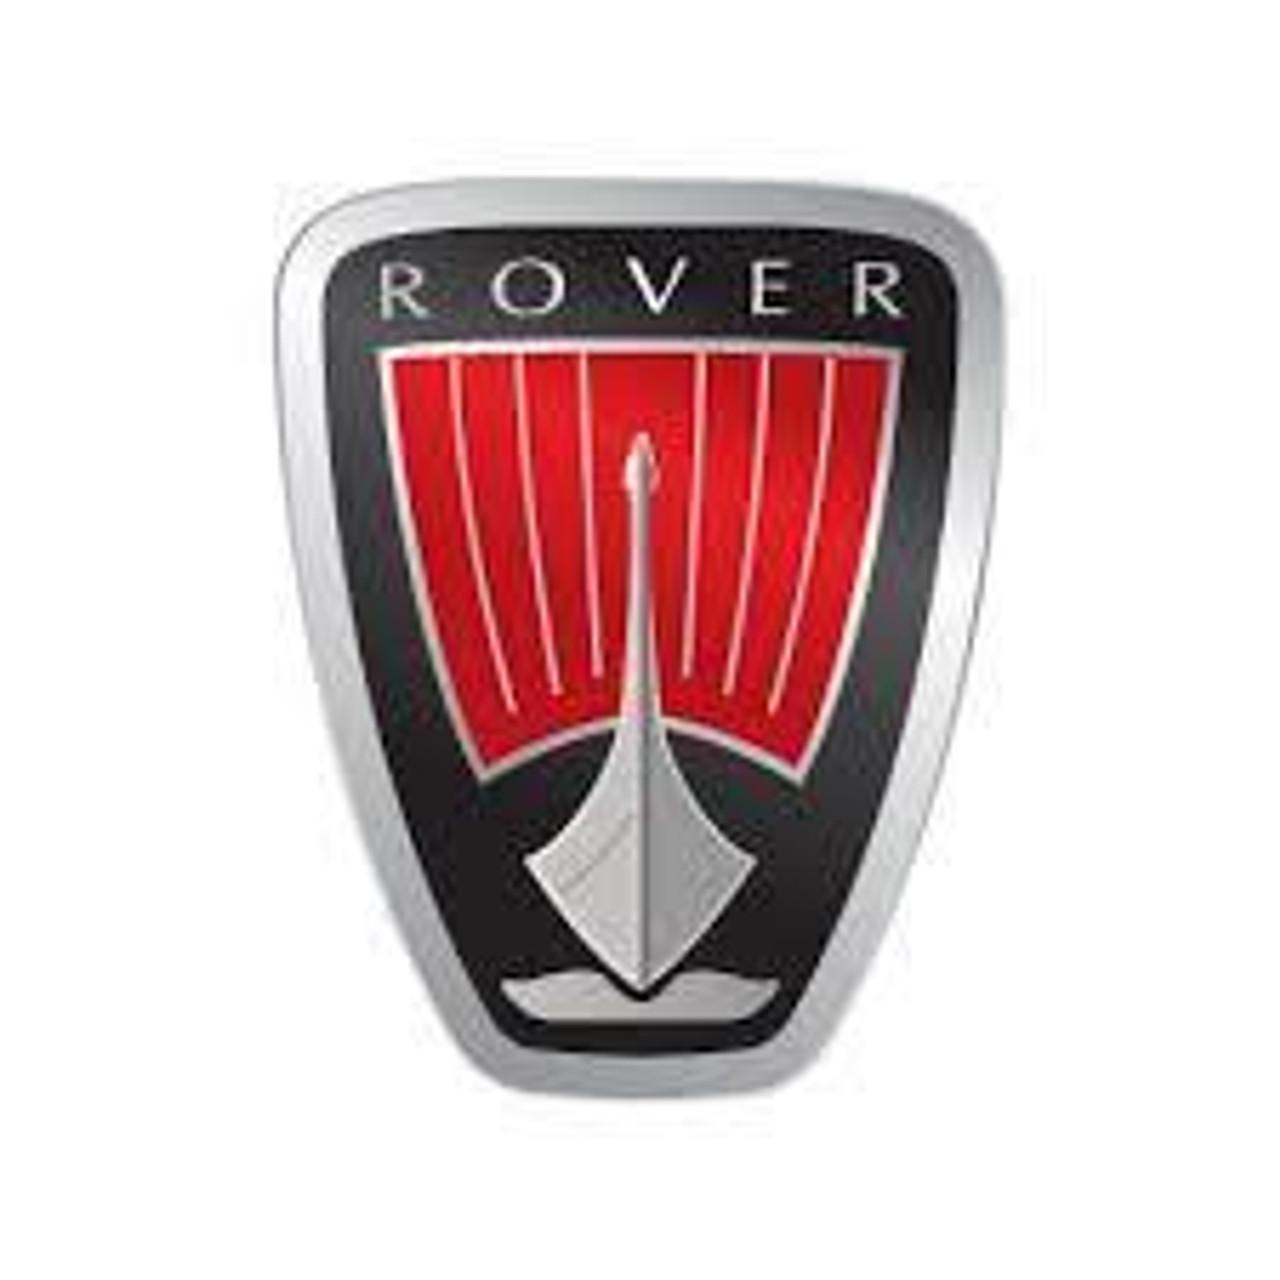 Morris & Rover